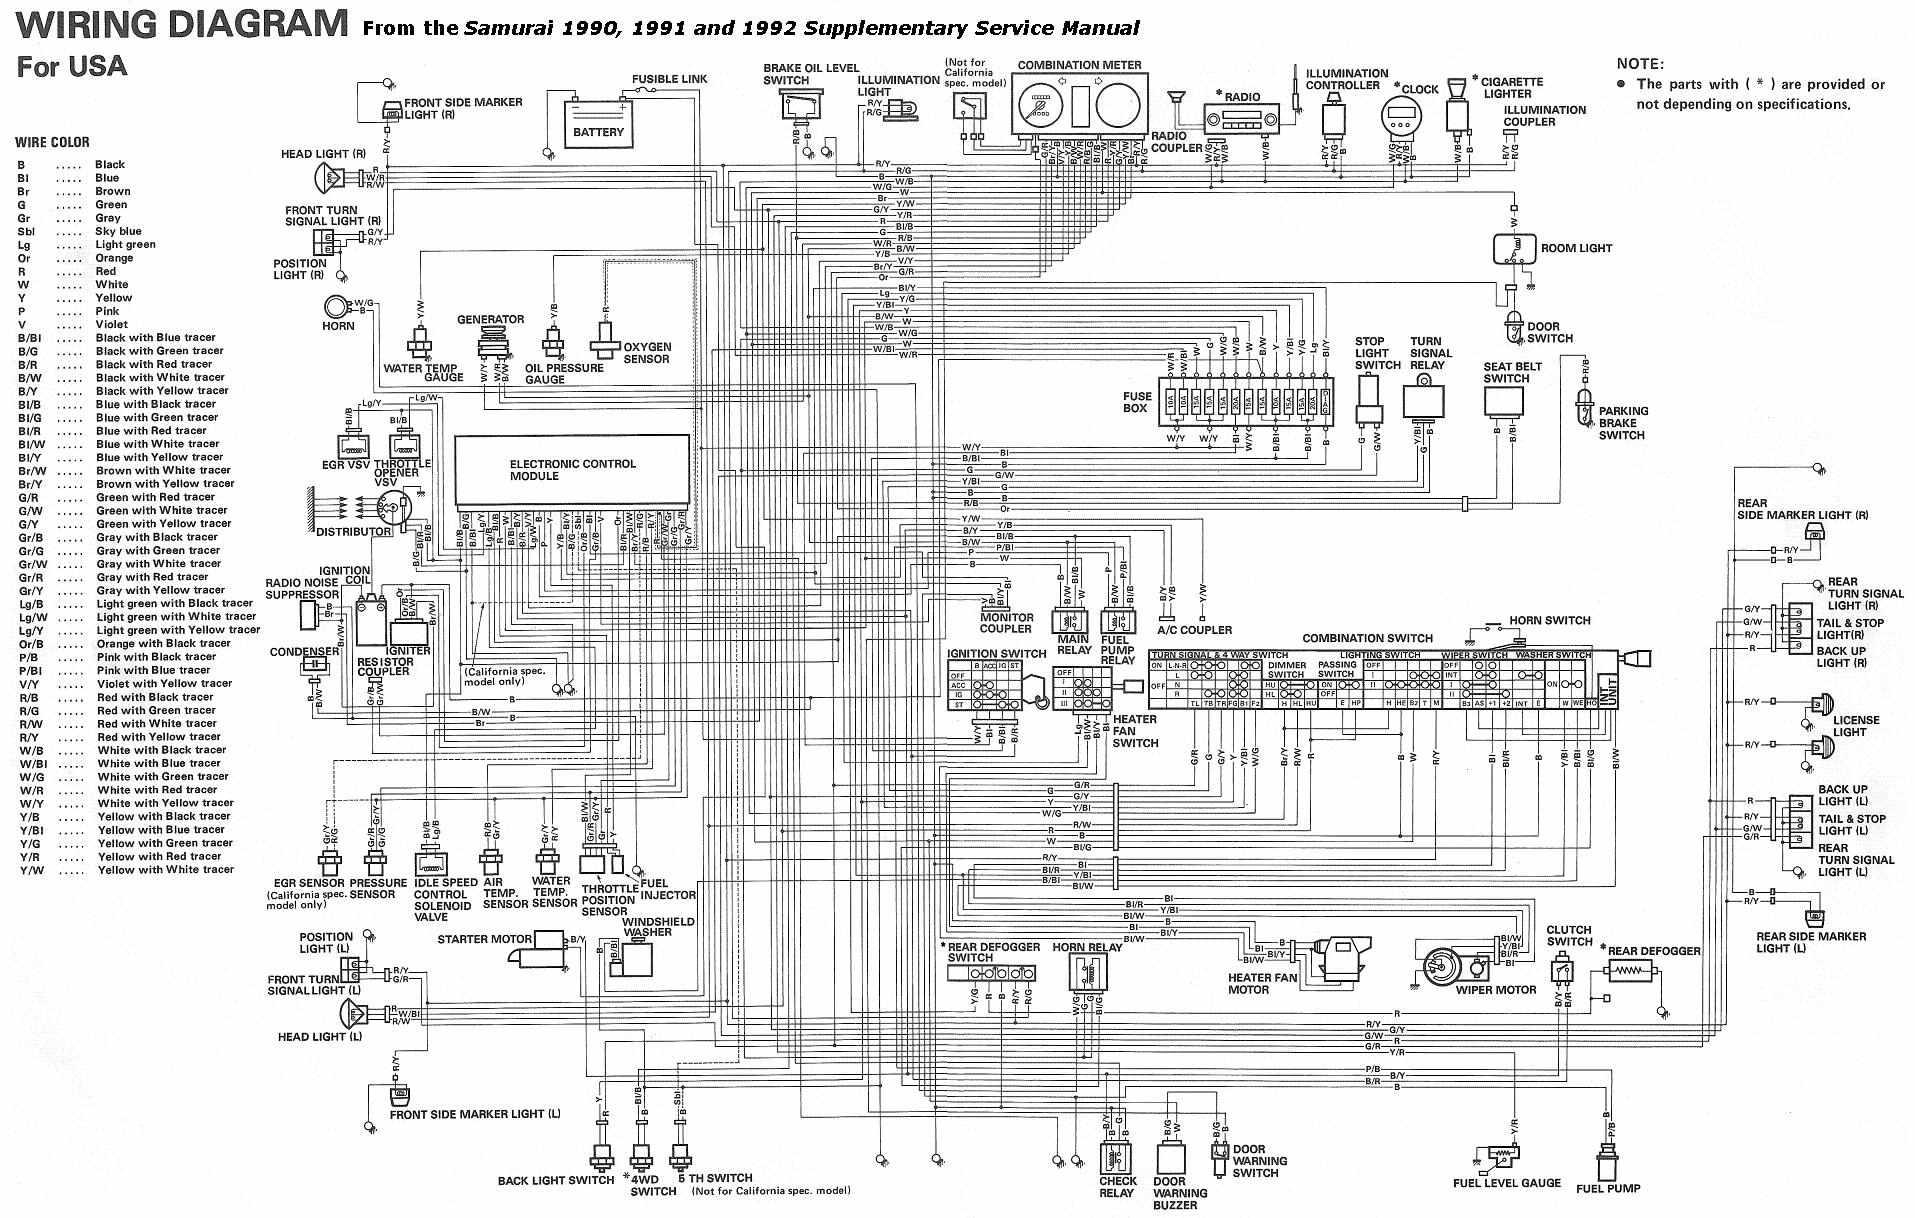 Subaru Kei Truck Wiring Diagram And Schematics Mitsubishi Mini Fuse Box Sambar Library Source Suzuki Carry Enthusiast Diagrams U2022 Amphicar